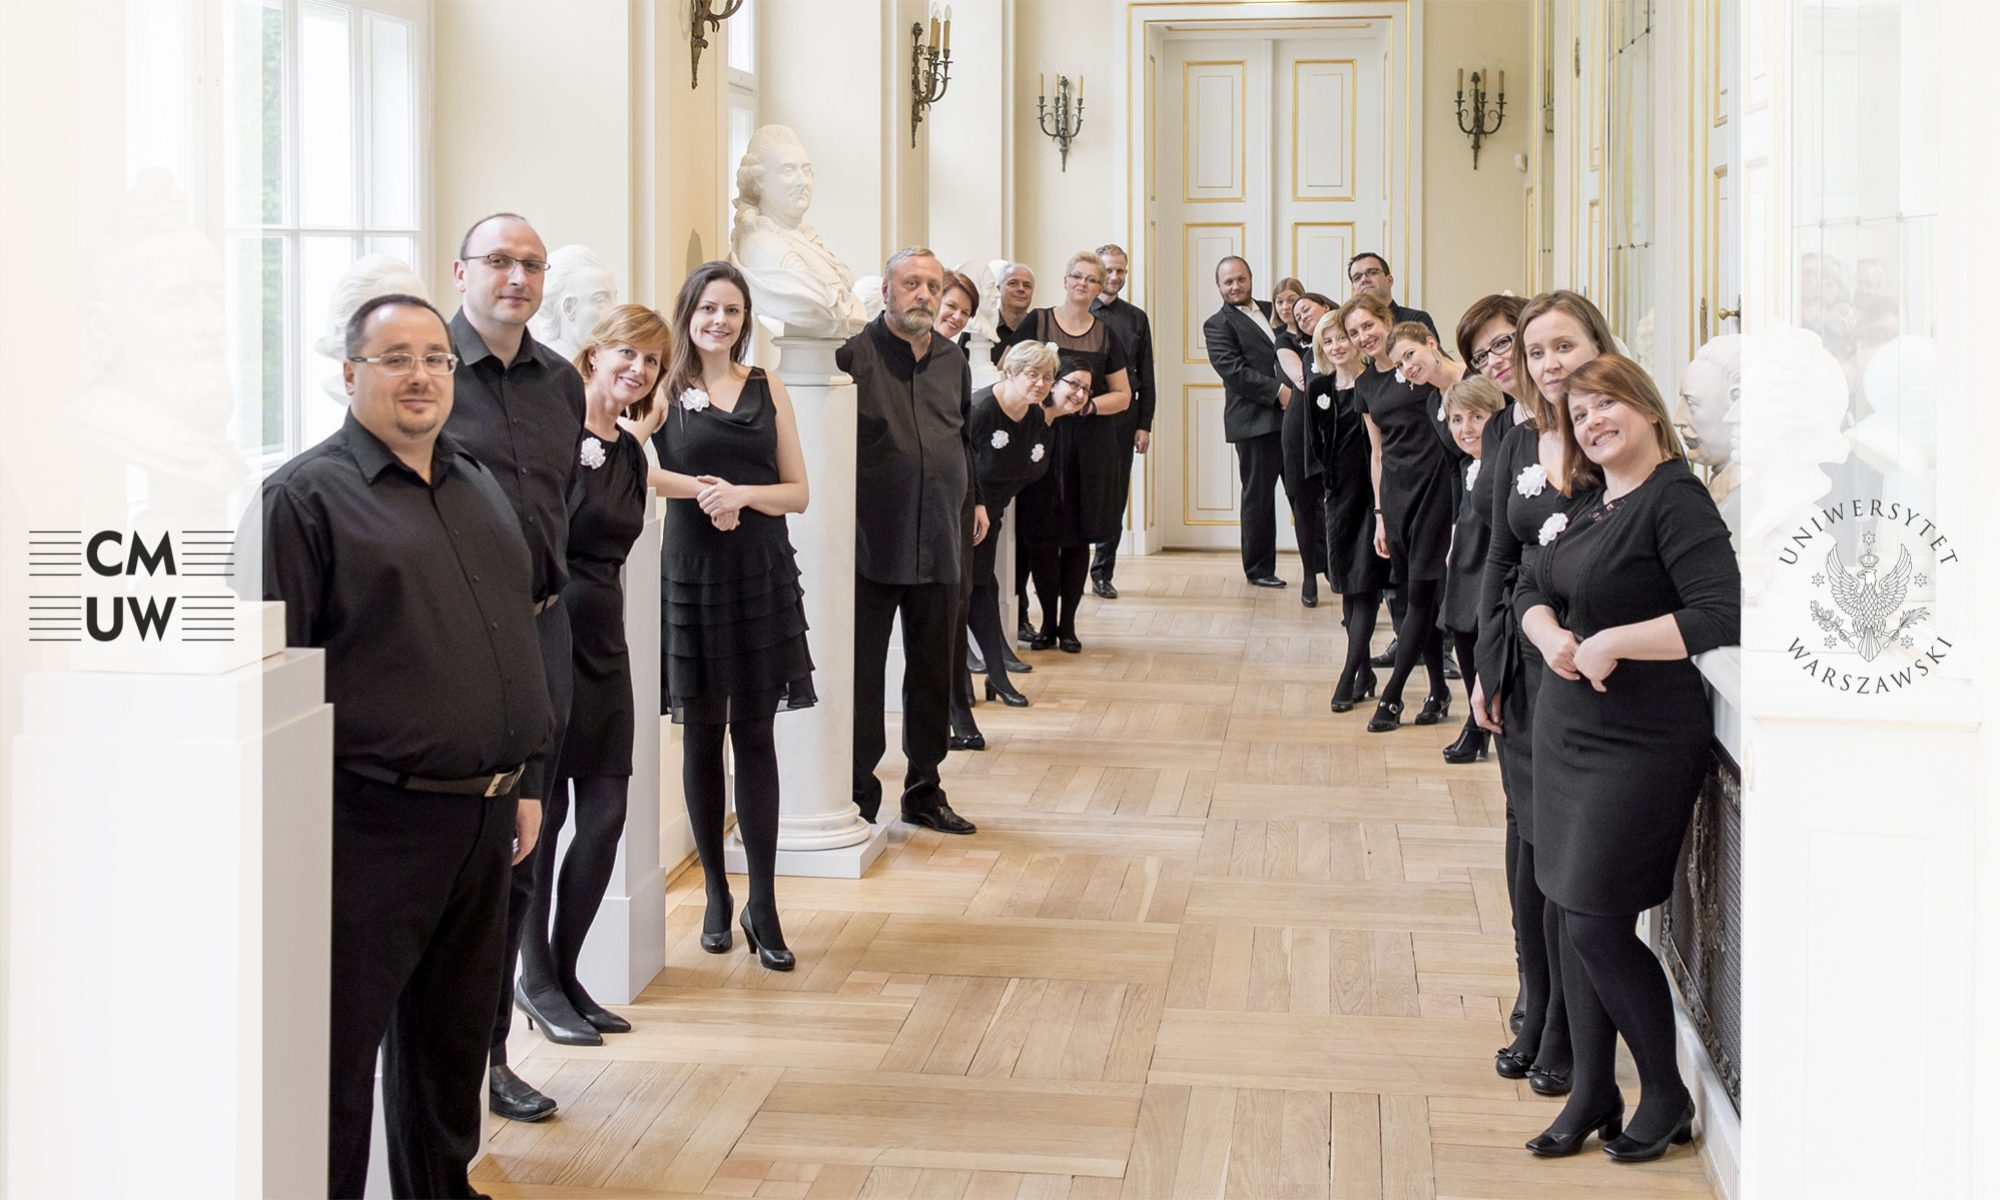 Chór Kameralny Collegium Musicum Uniwersytetu Warszawskiego